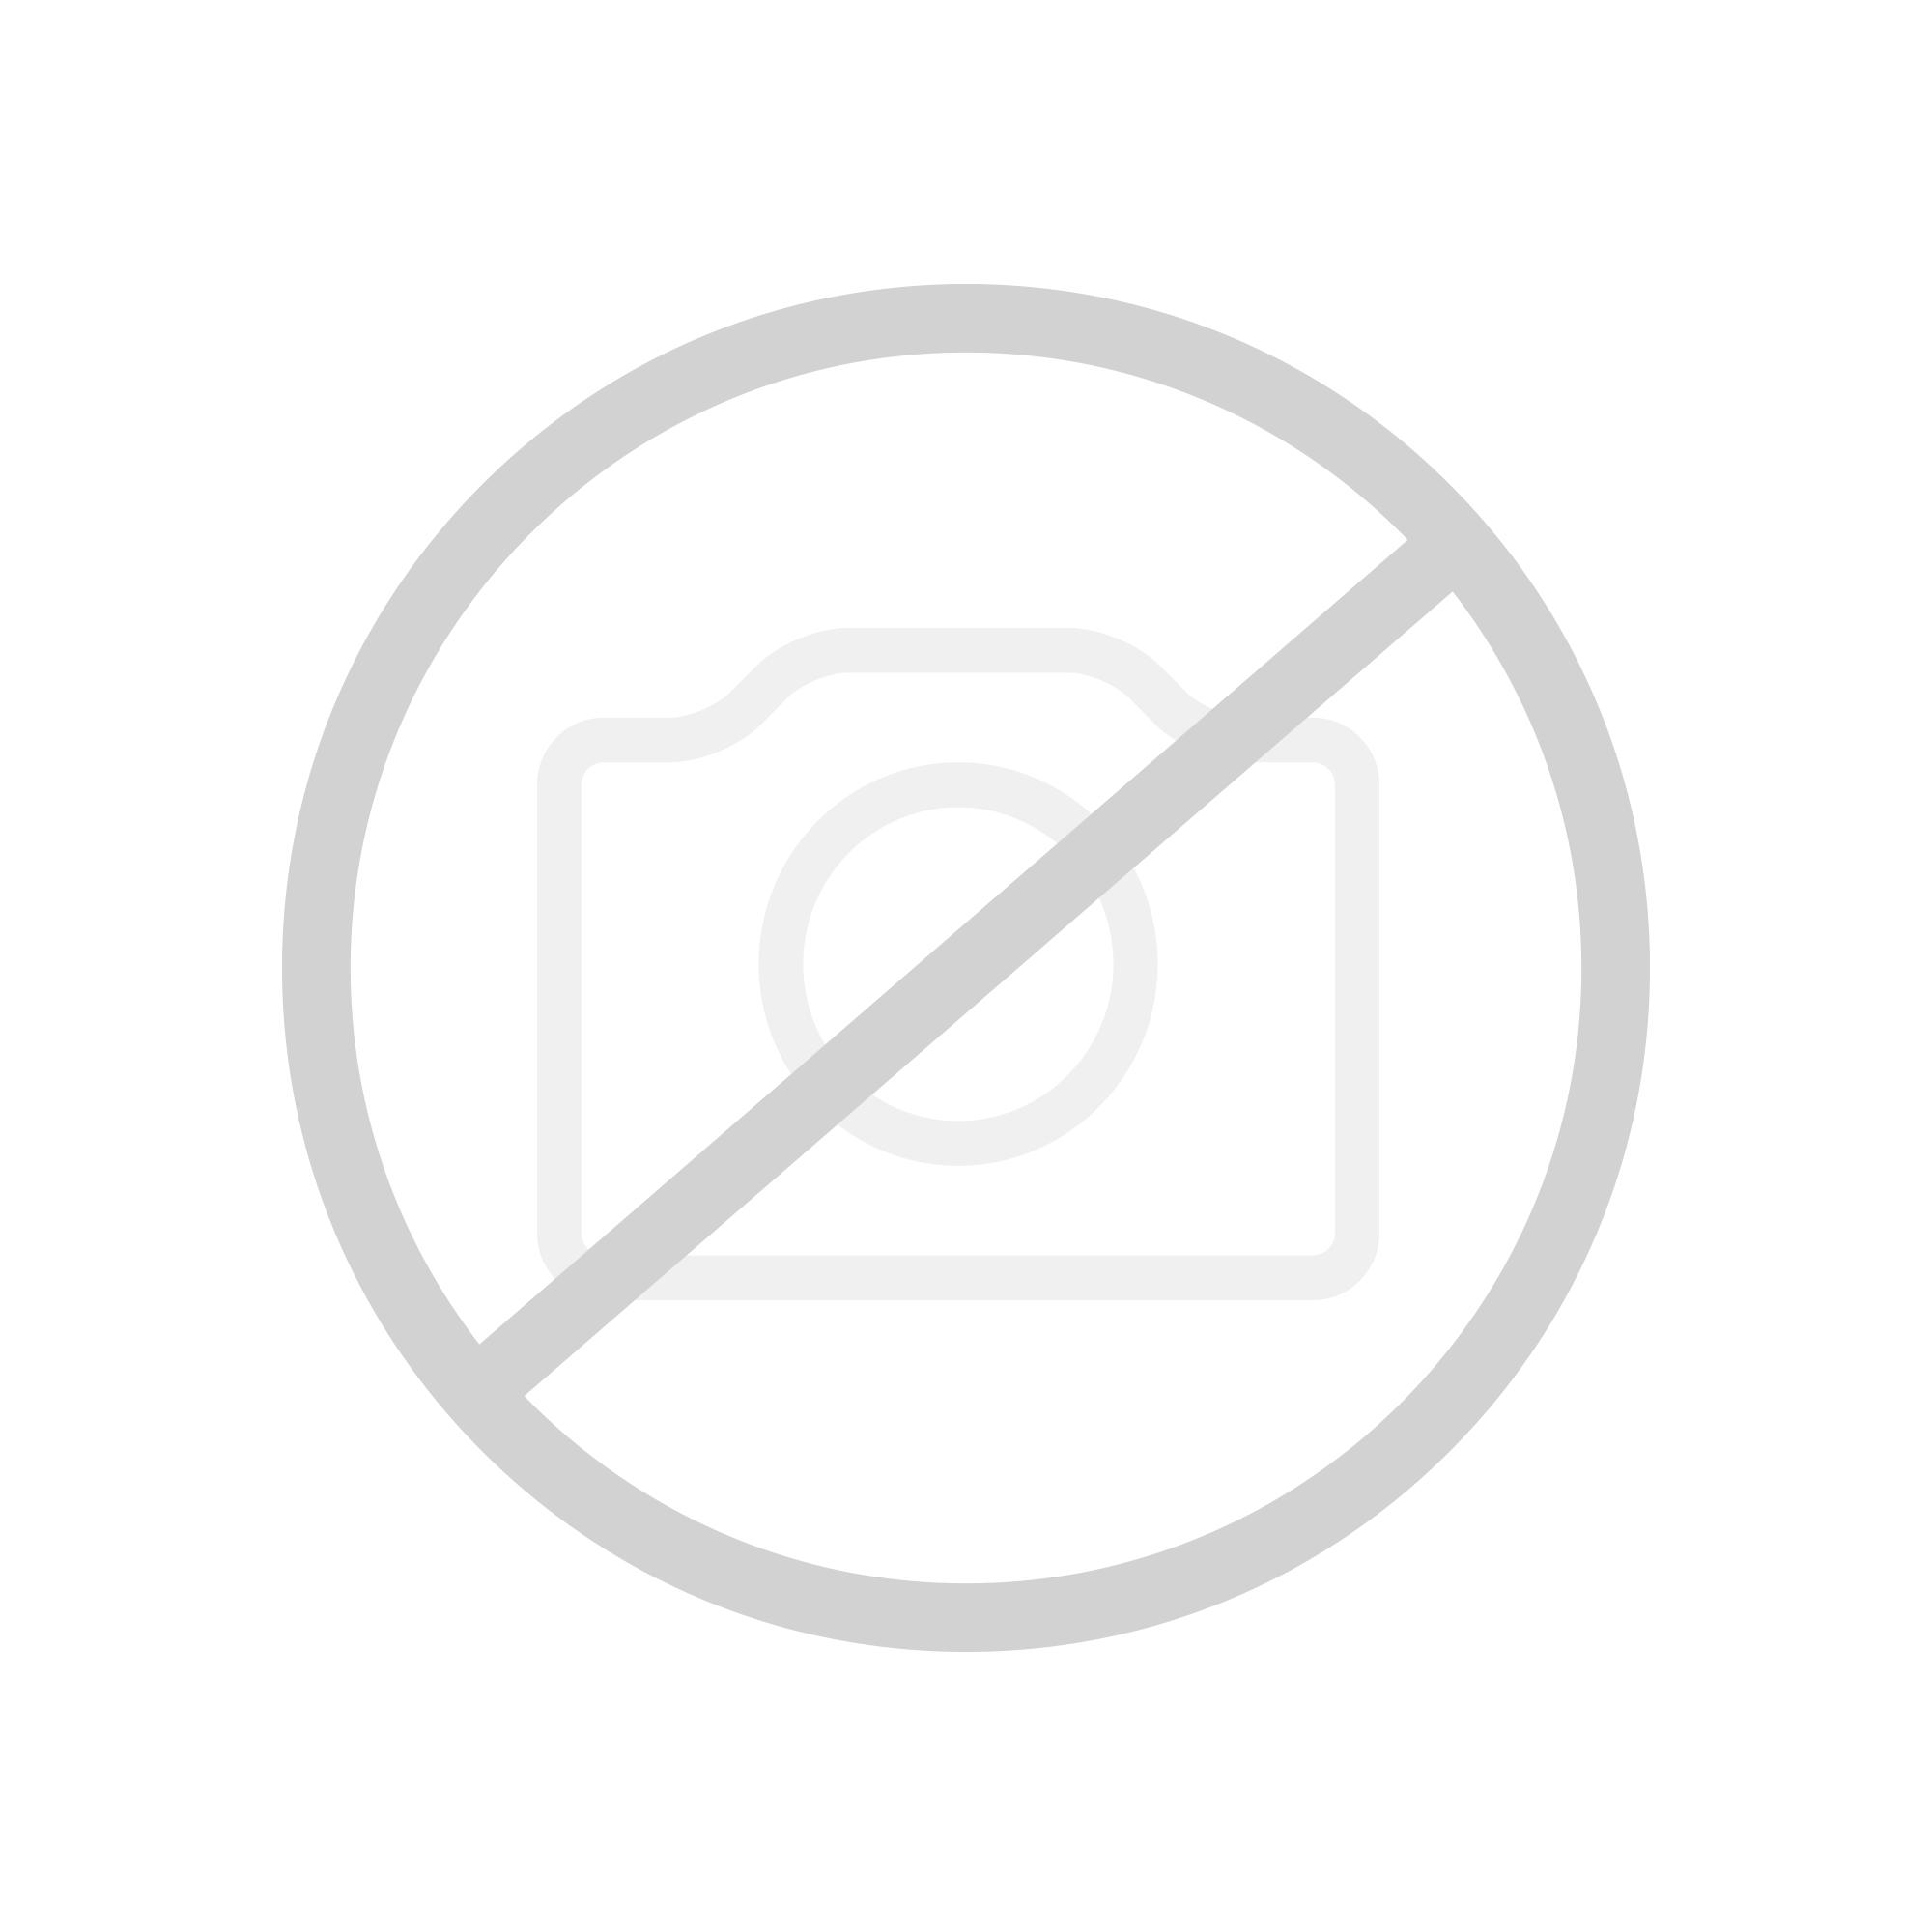 Bette Ablaufgarnitur, senkrechte Entwässerung, 0,6 l/s Komplett-Set weiß